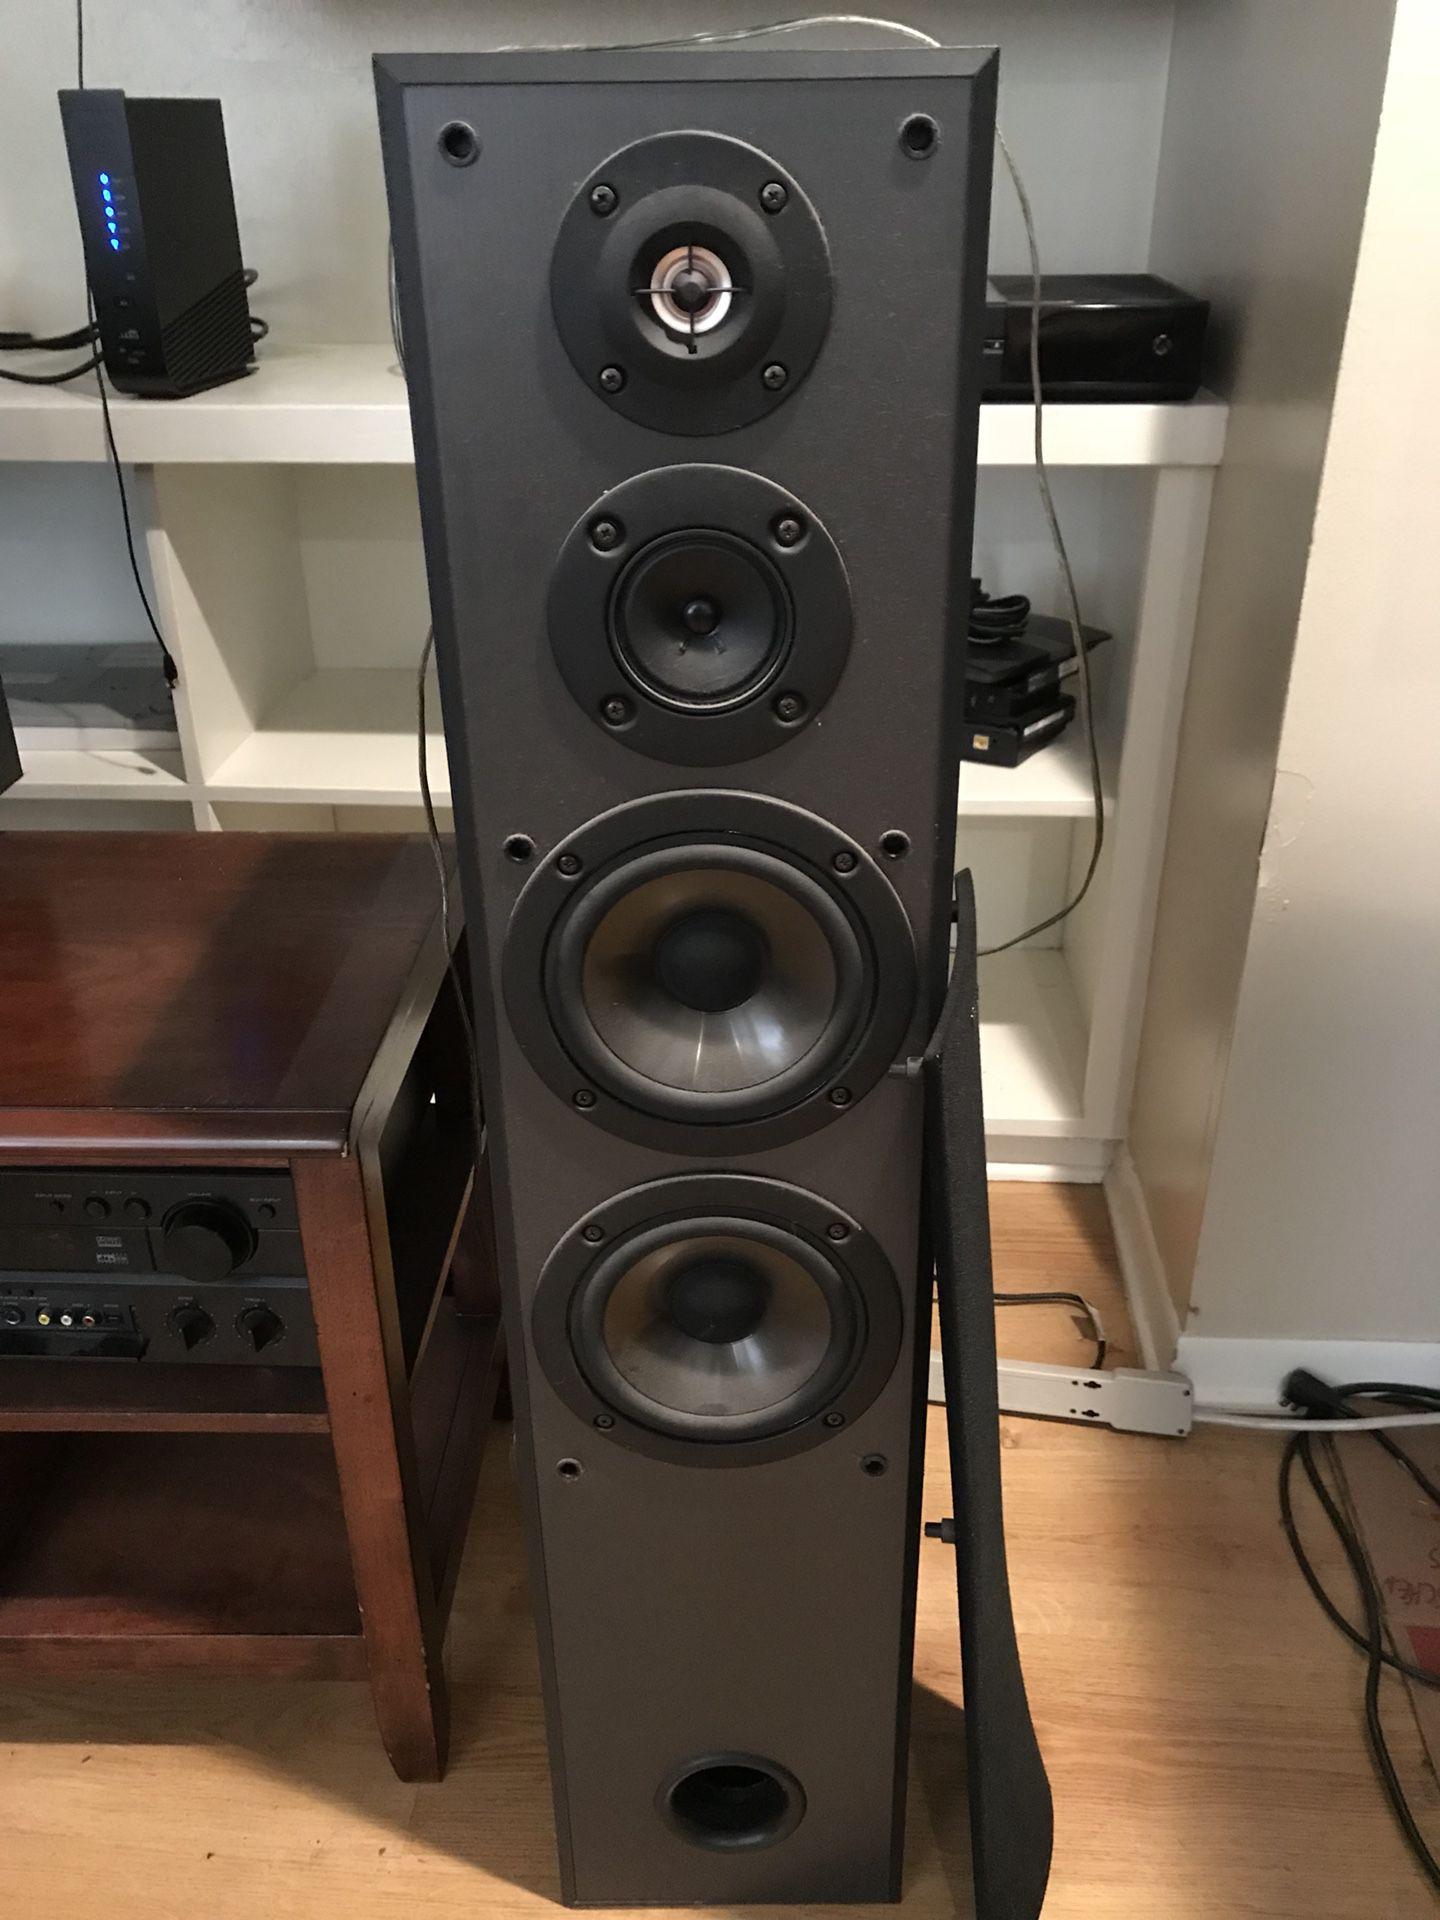 Home audio speaker system